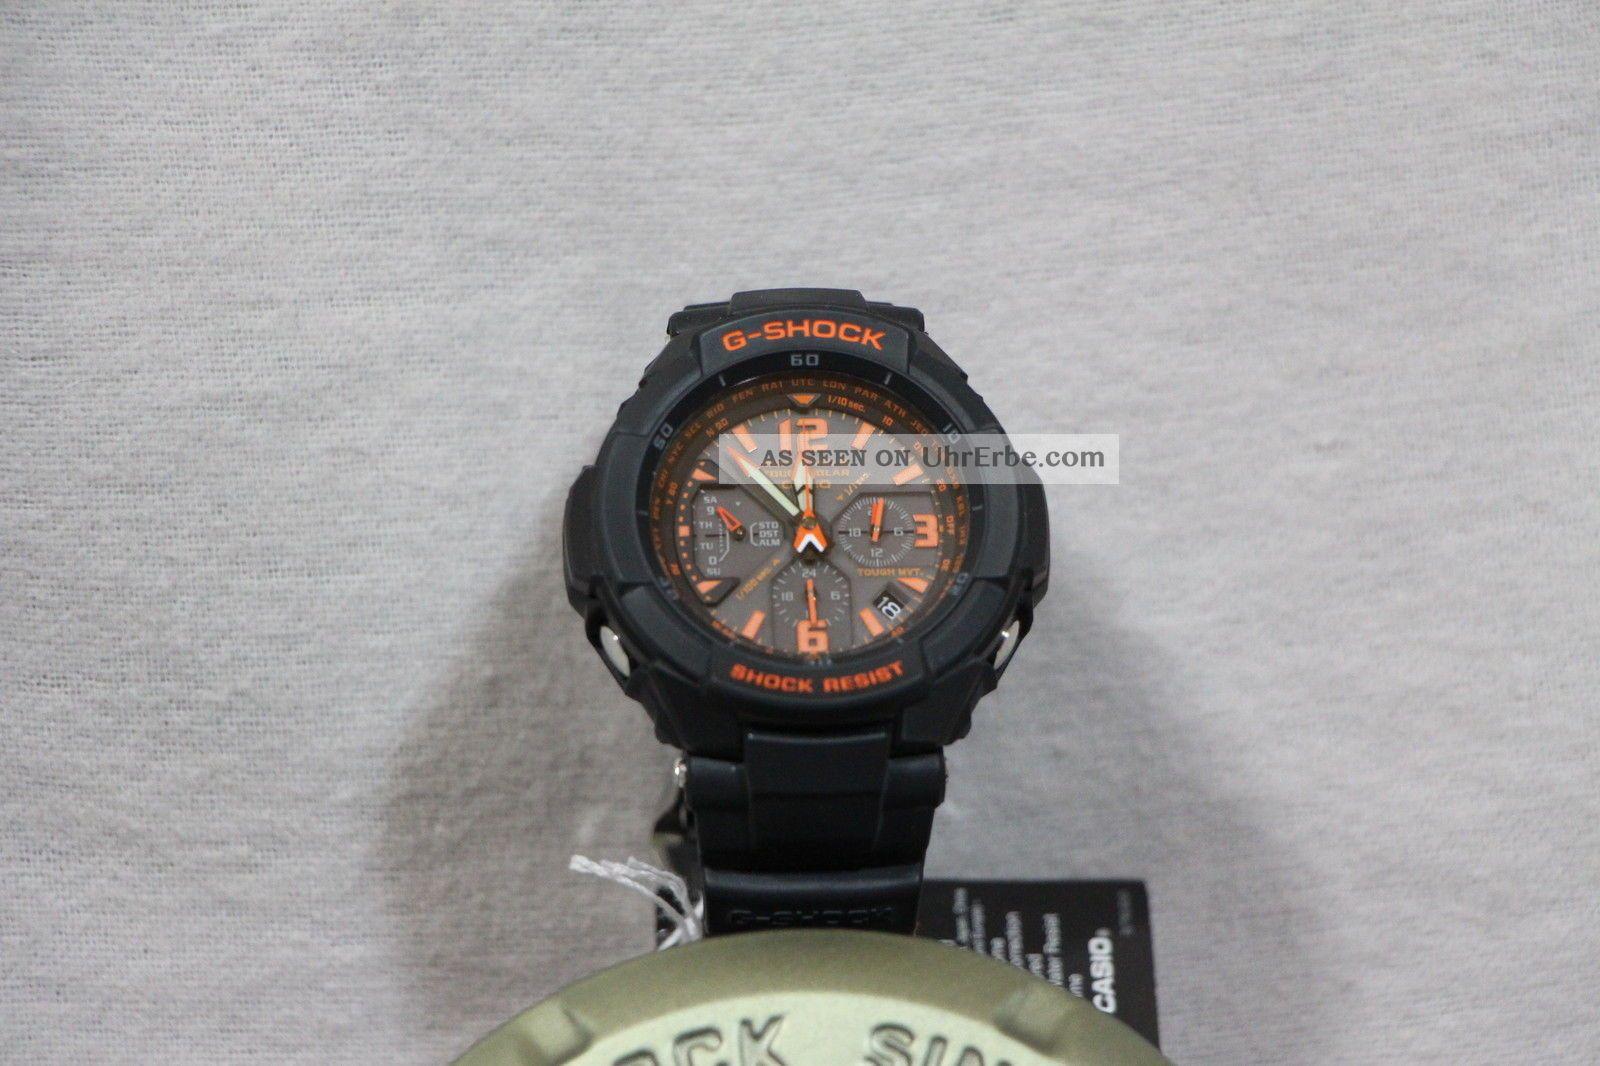 Casio Uhr Armbanduhr Herren Gw - 3000bd - 1aer G - Shock 200 Meter Wasserdicht Armbanduhren Bild